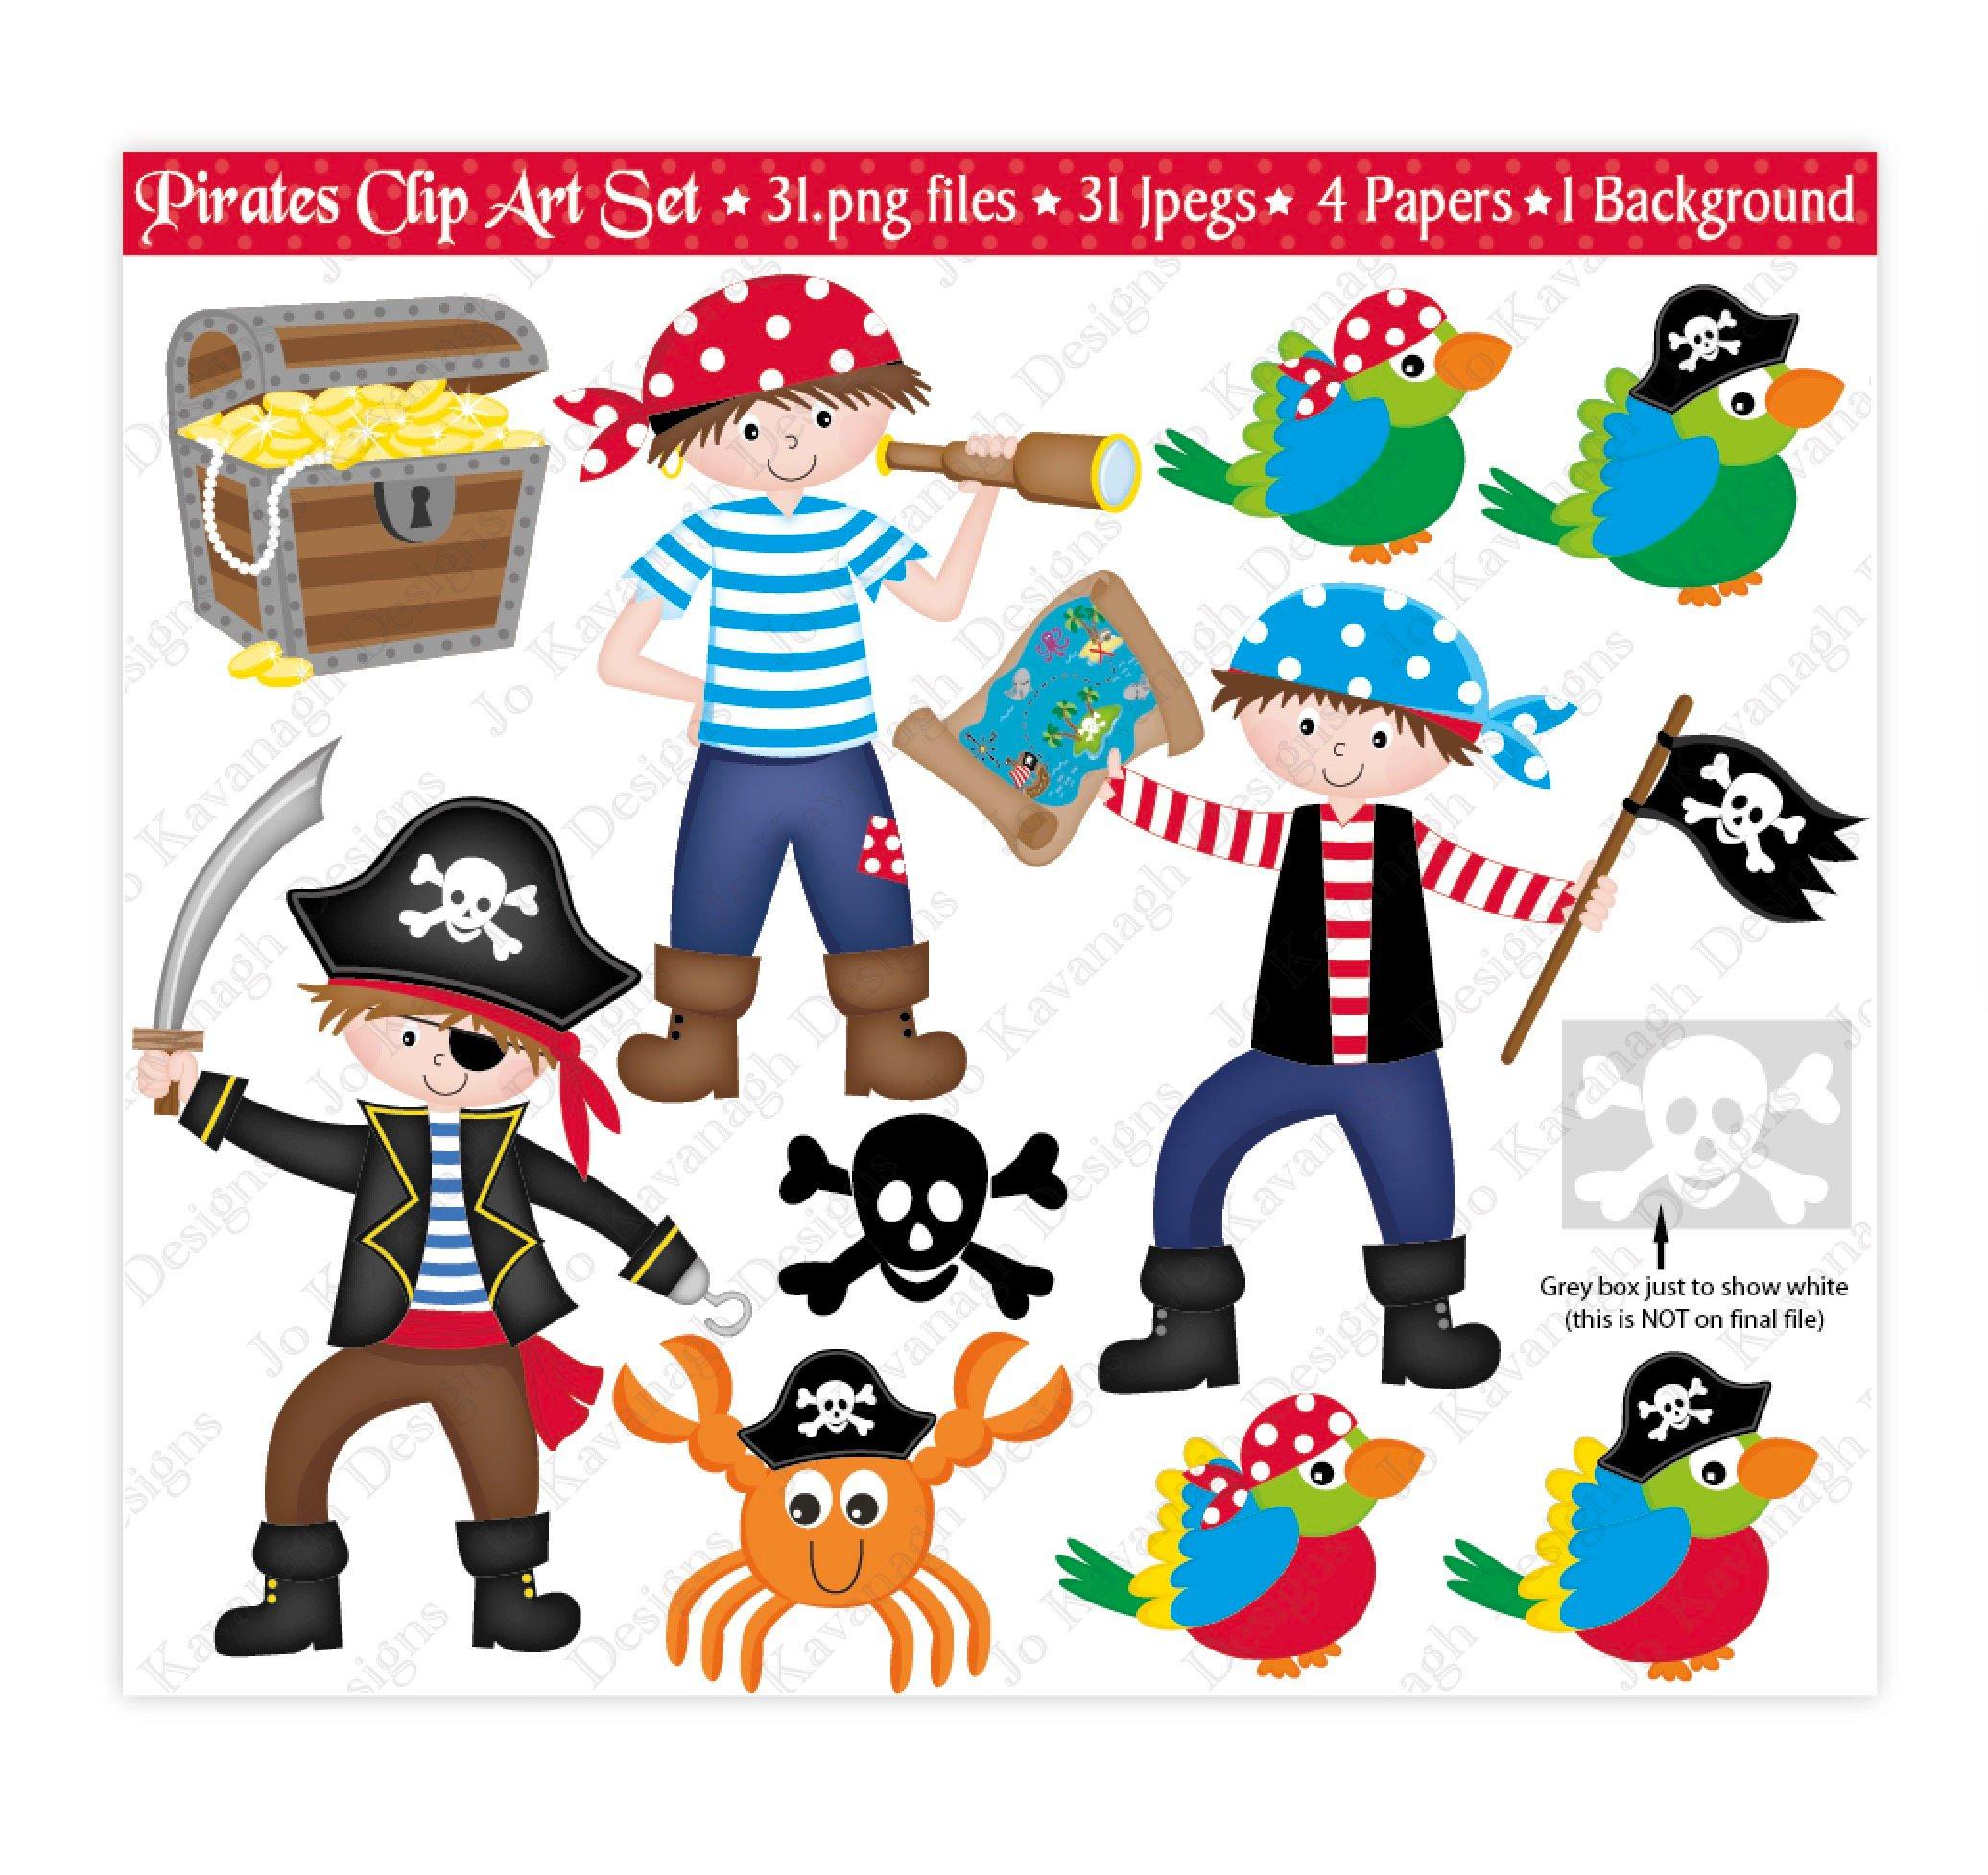 Pirate Boat Clipart at GetDrawings.com.